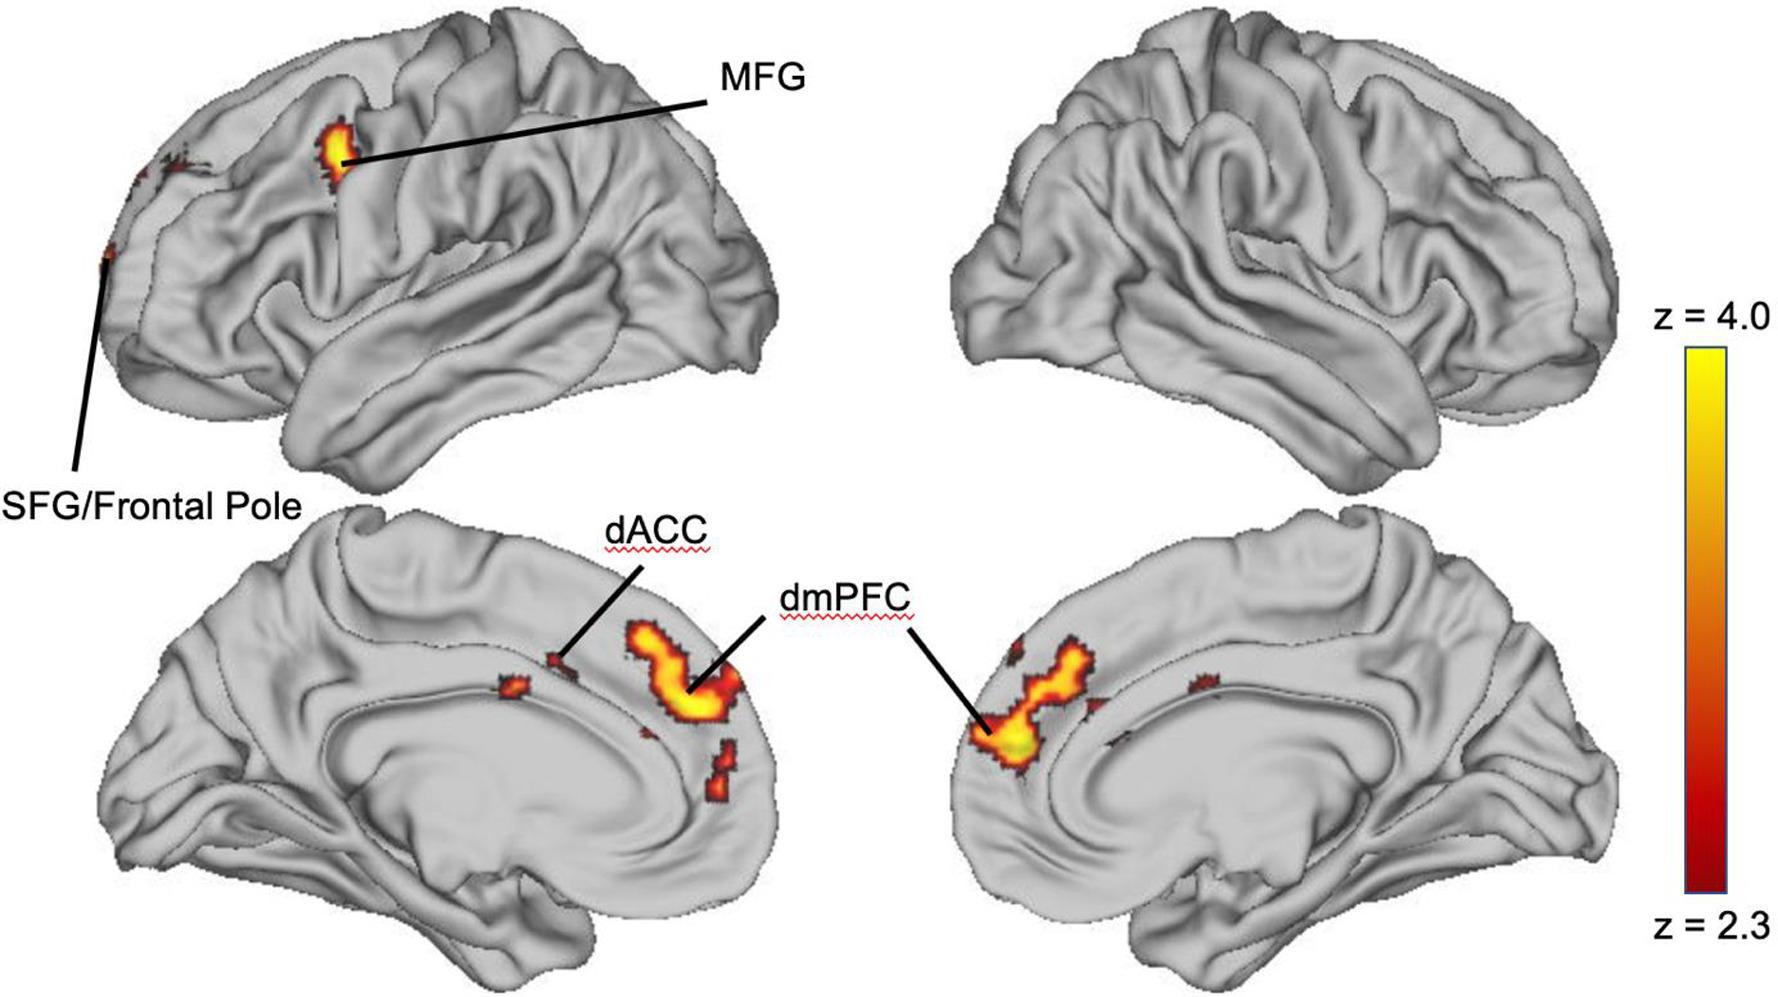 О влиянии шлепков на развитие детского мозга